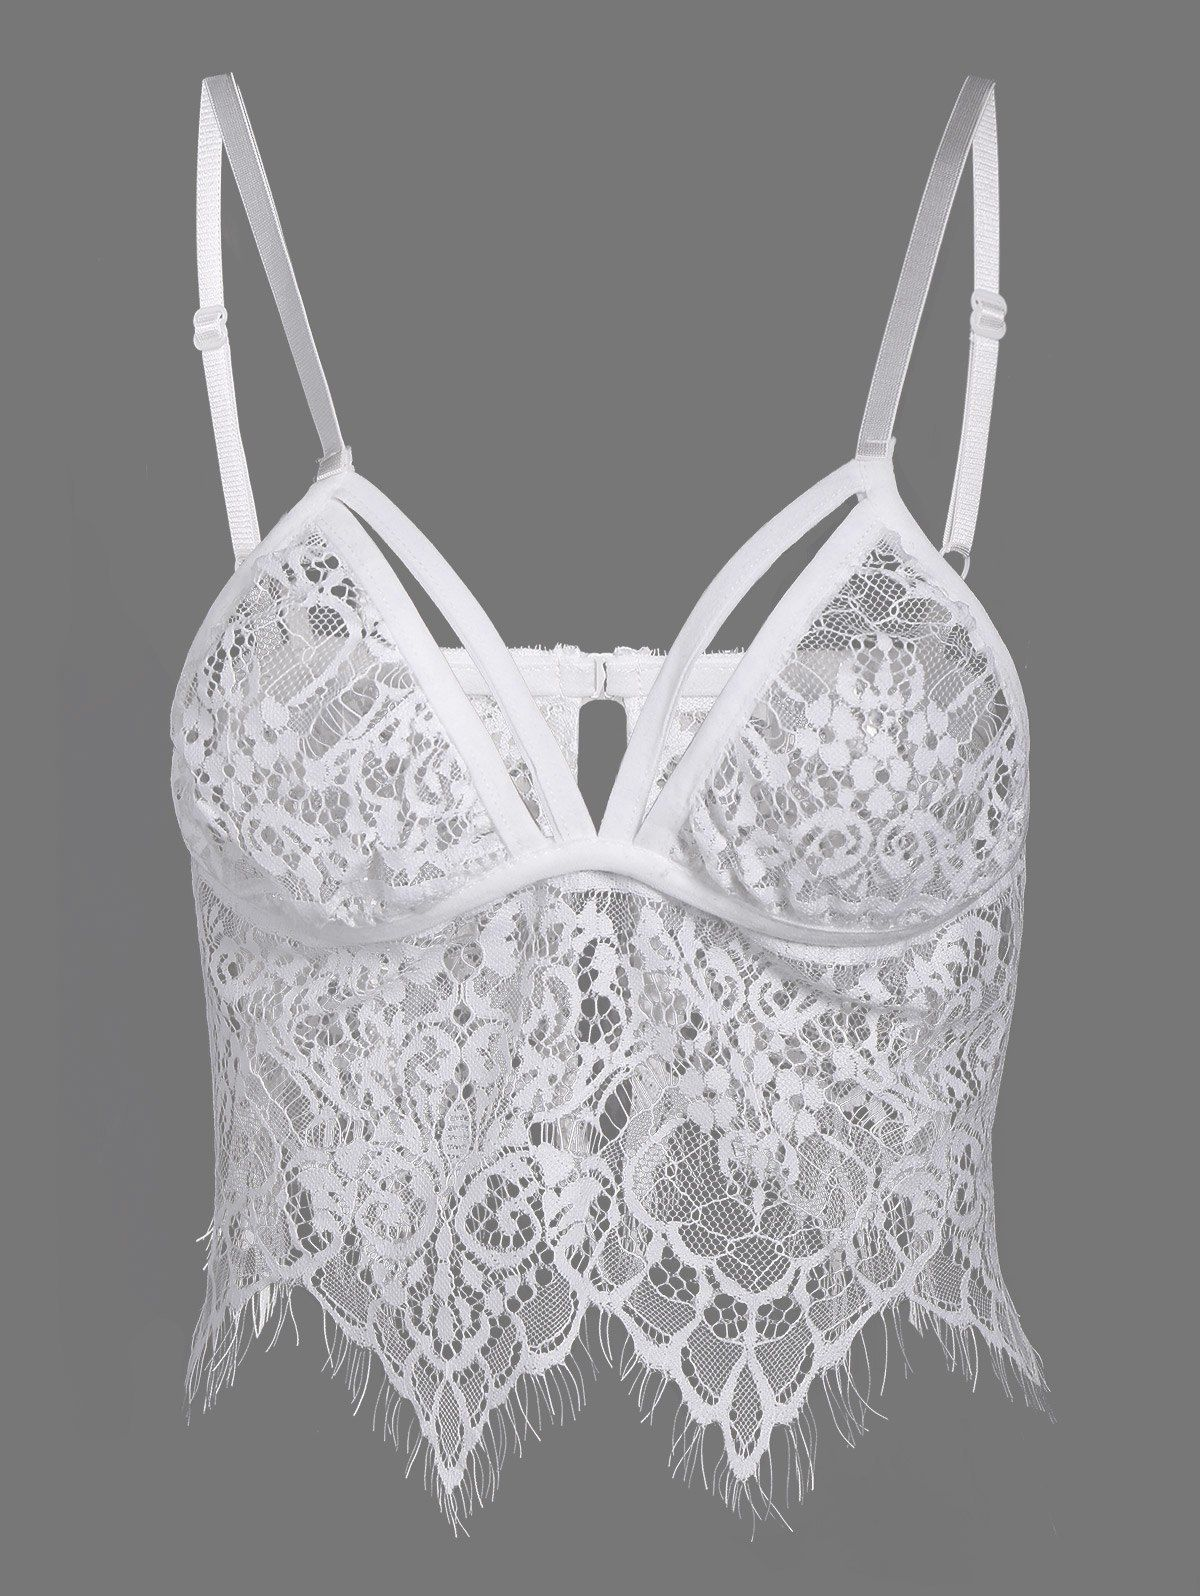 Bra for wedding dress shopping  Seamless Wave Cut Lace Bra  La Moda  Pinterest  Lace bra